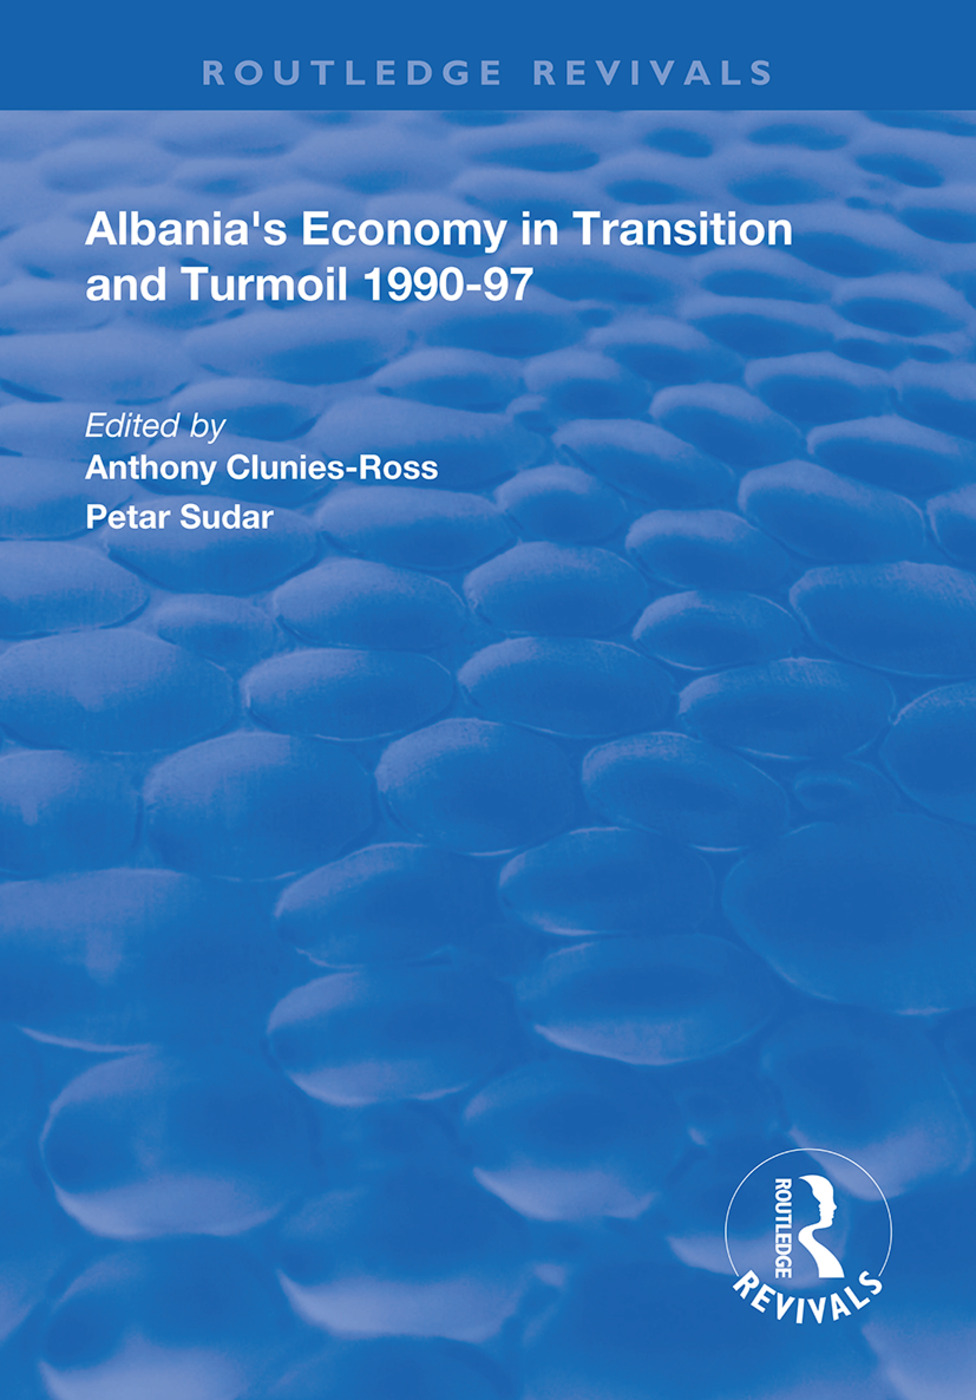 Albania's Economy in Transition and Turmoil 1990-97